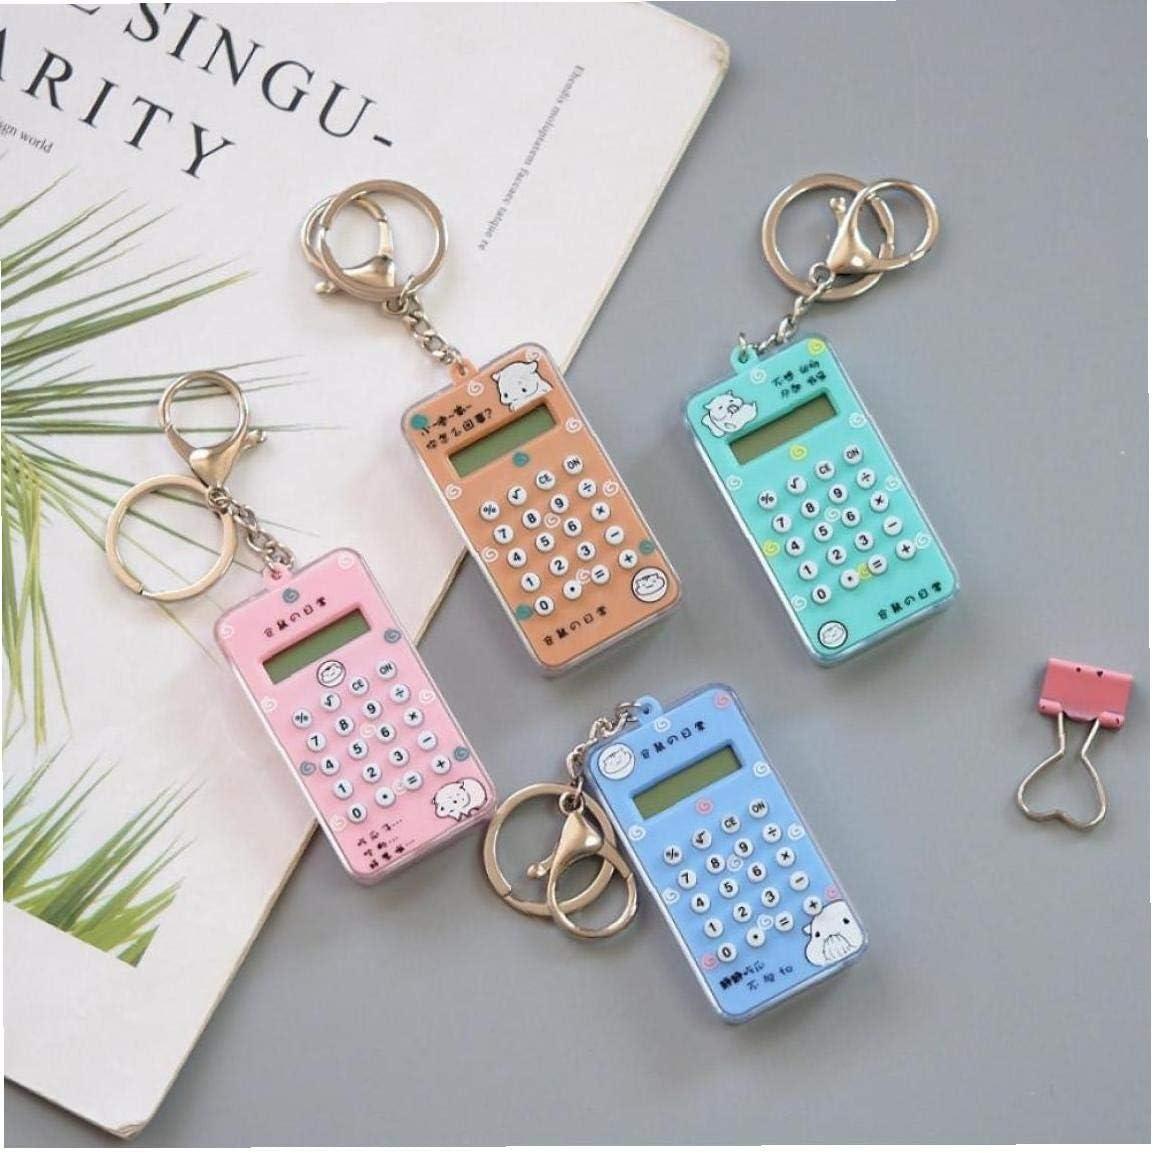 PiniceCore Pocket Mini Calculator Keychain 8 Digits Display School Calculadora Portable with Mini Maze random Color